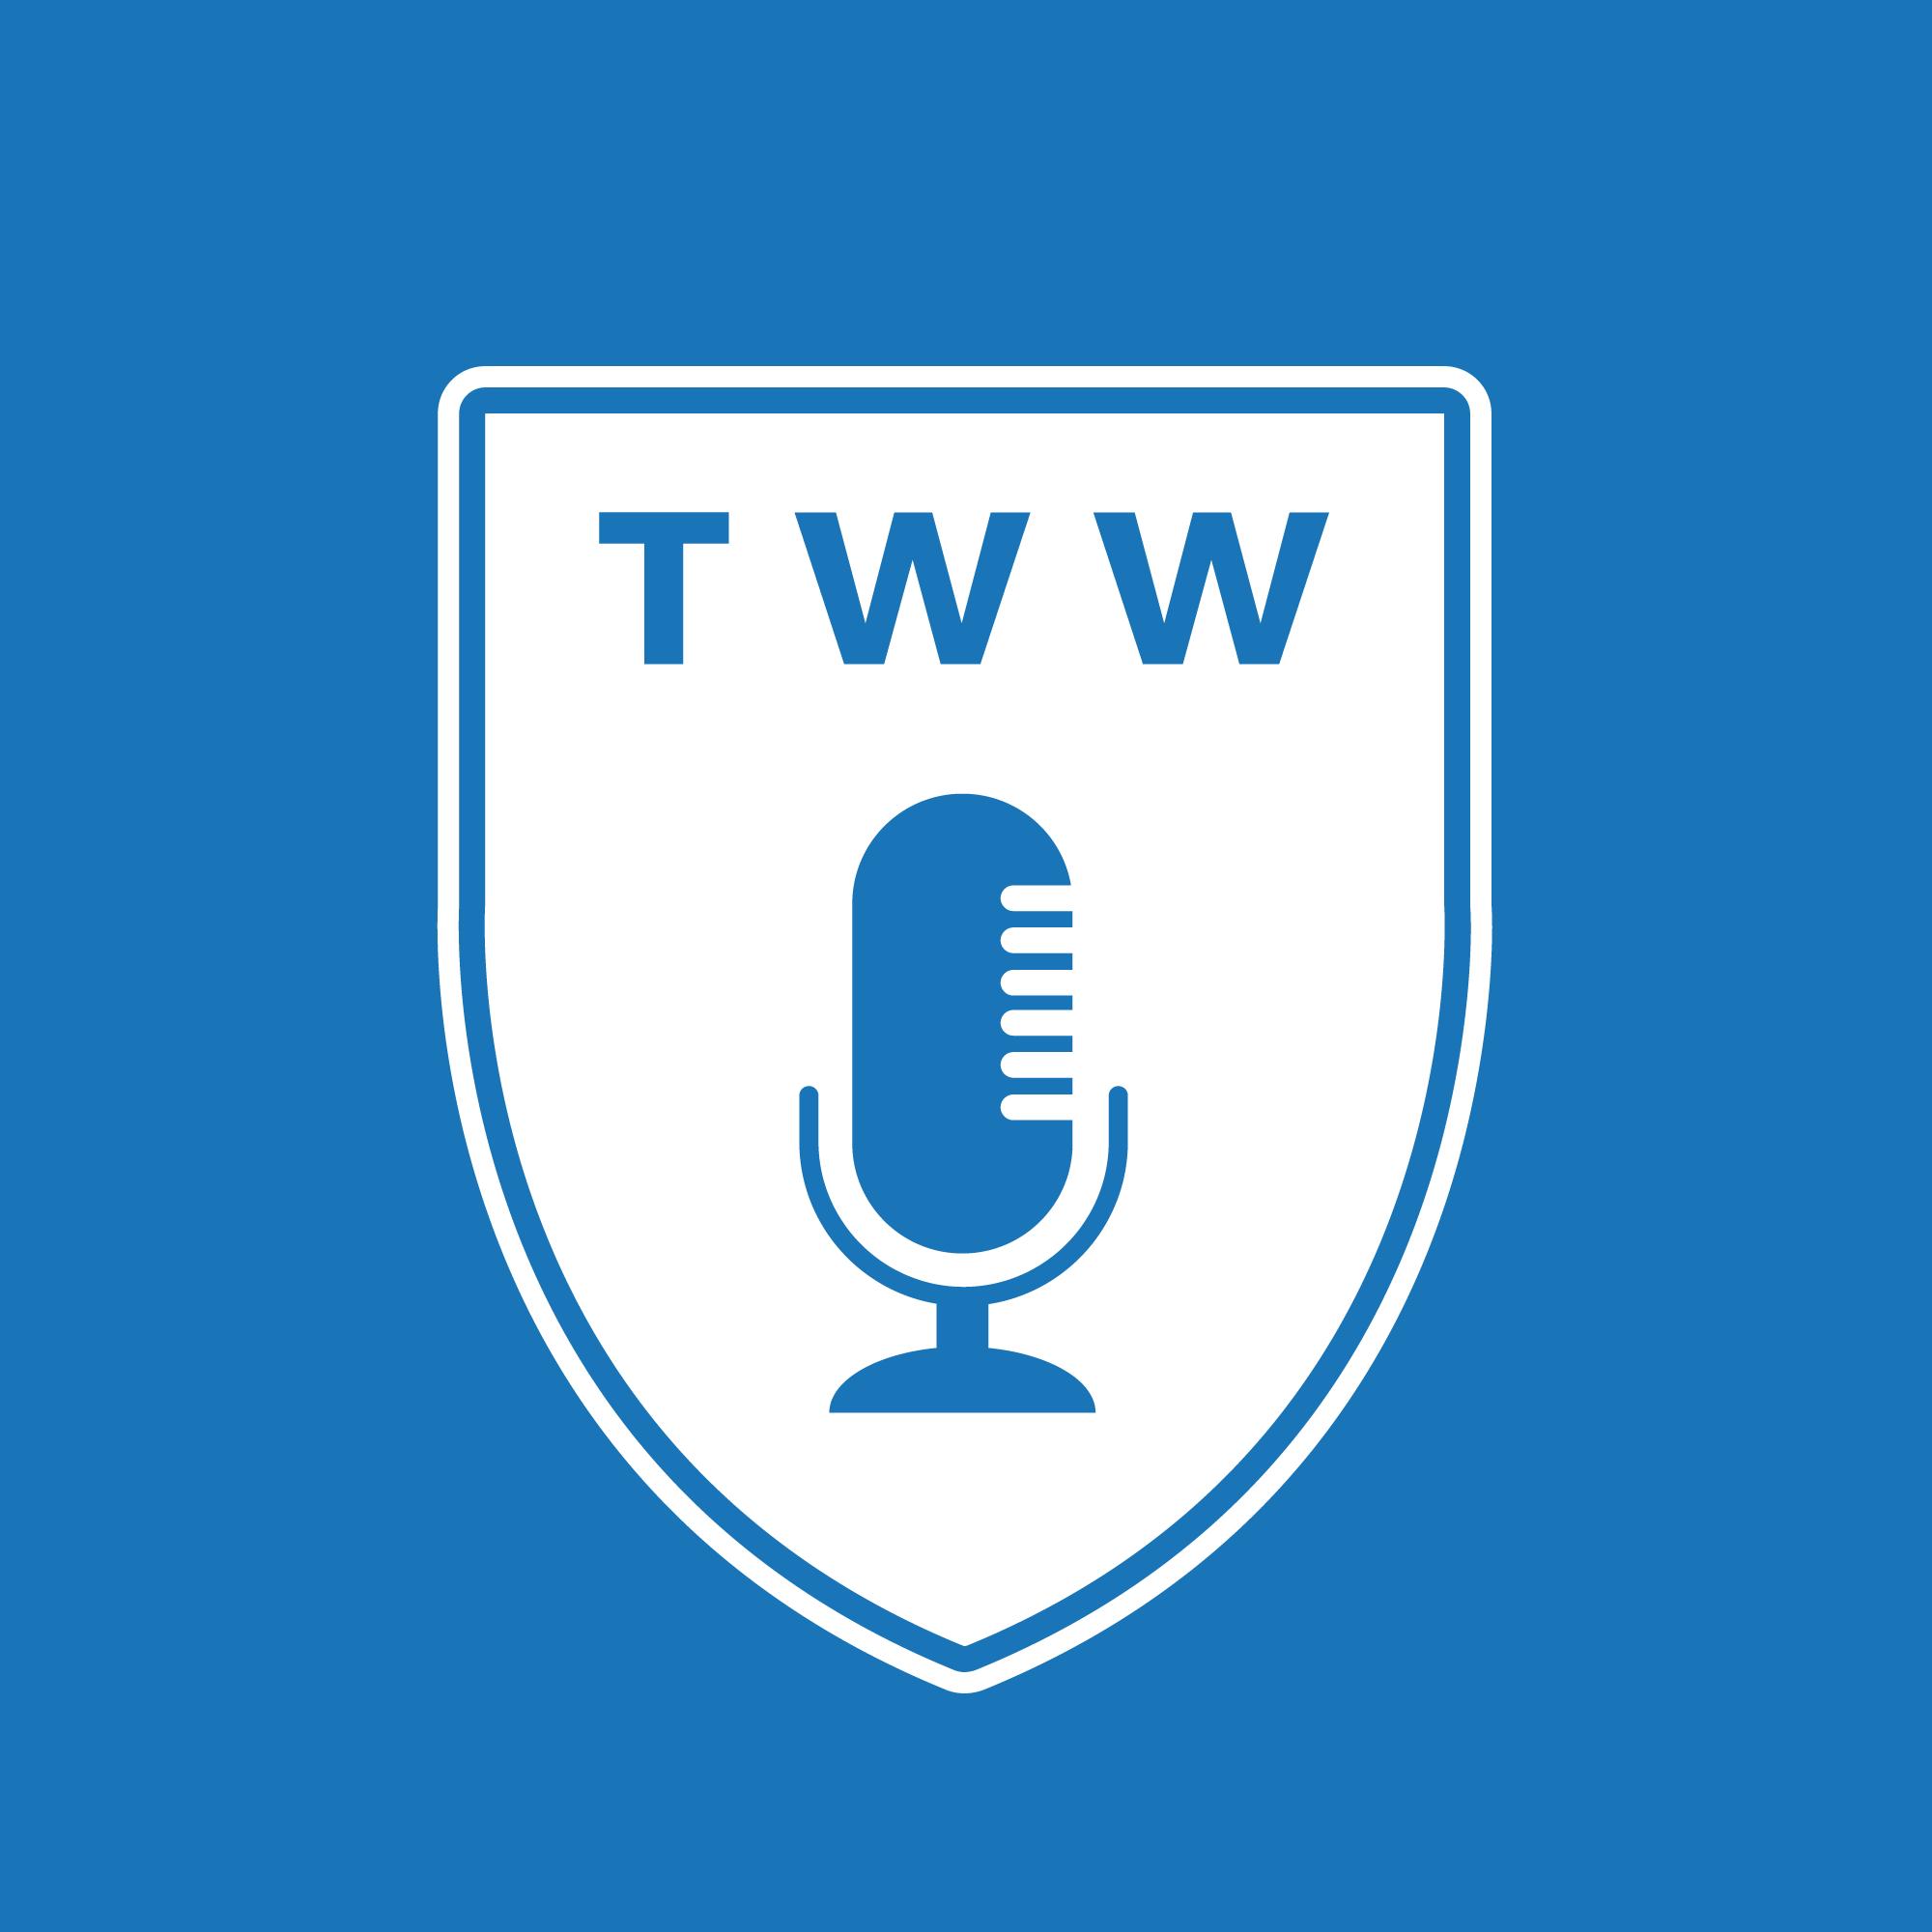 tww-2000x2000-2-square